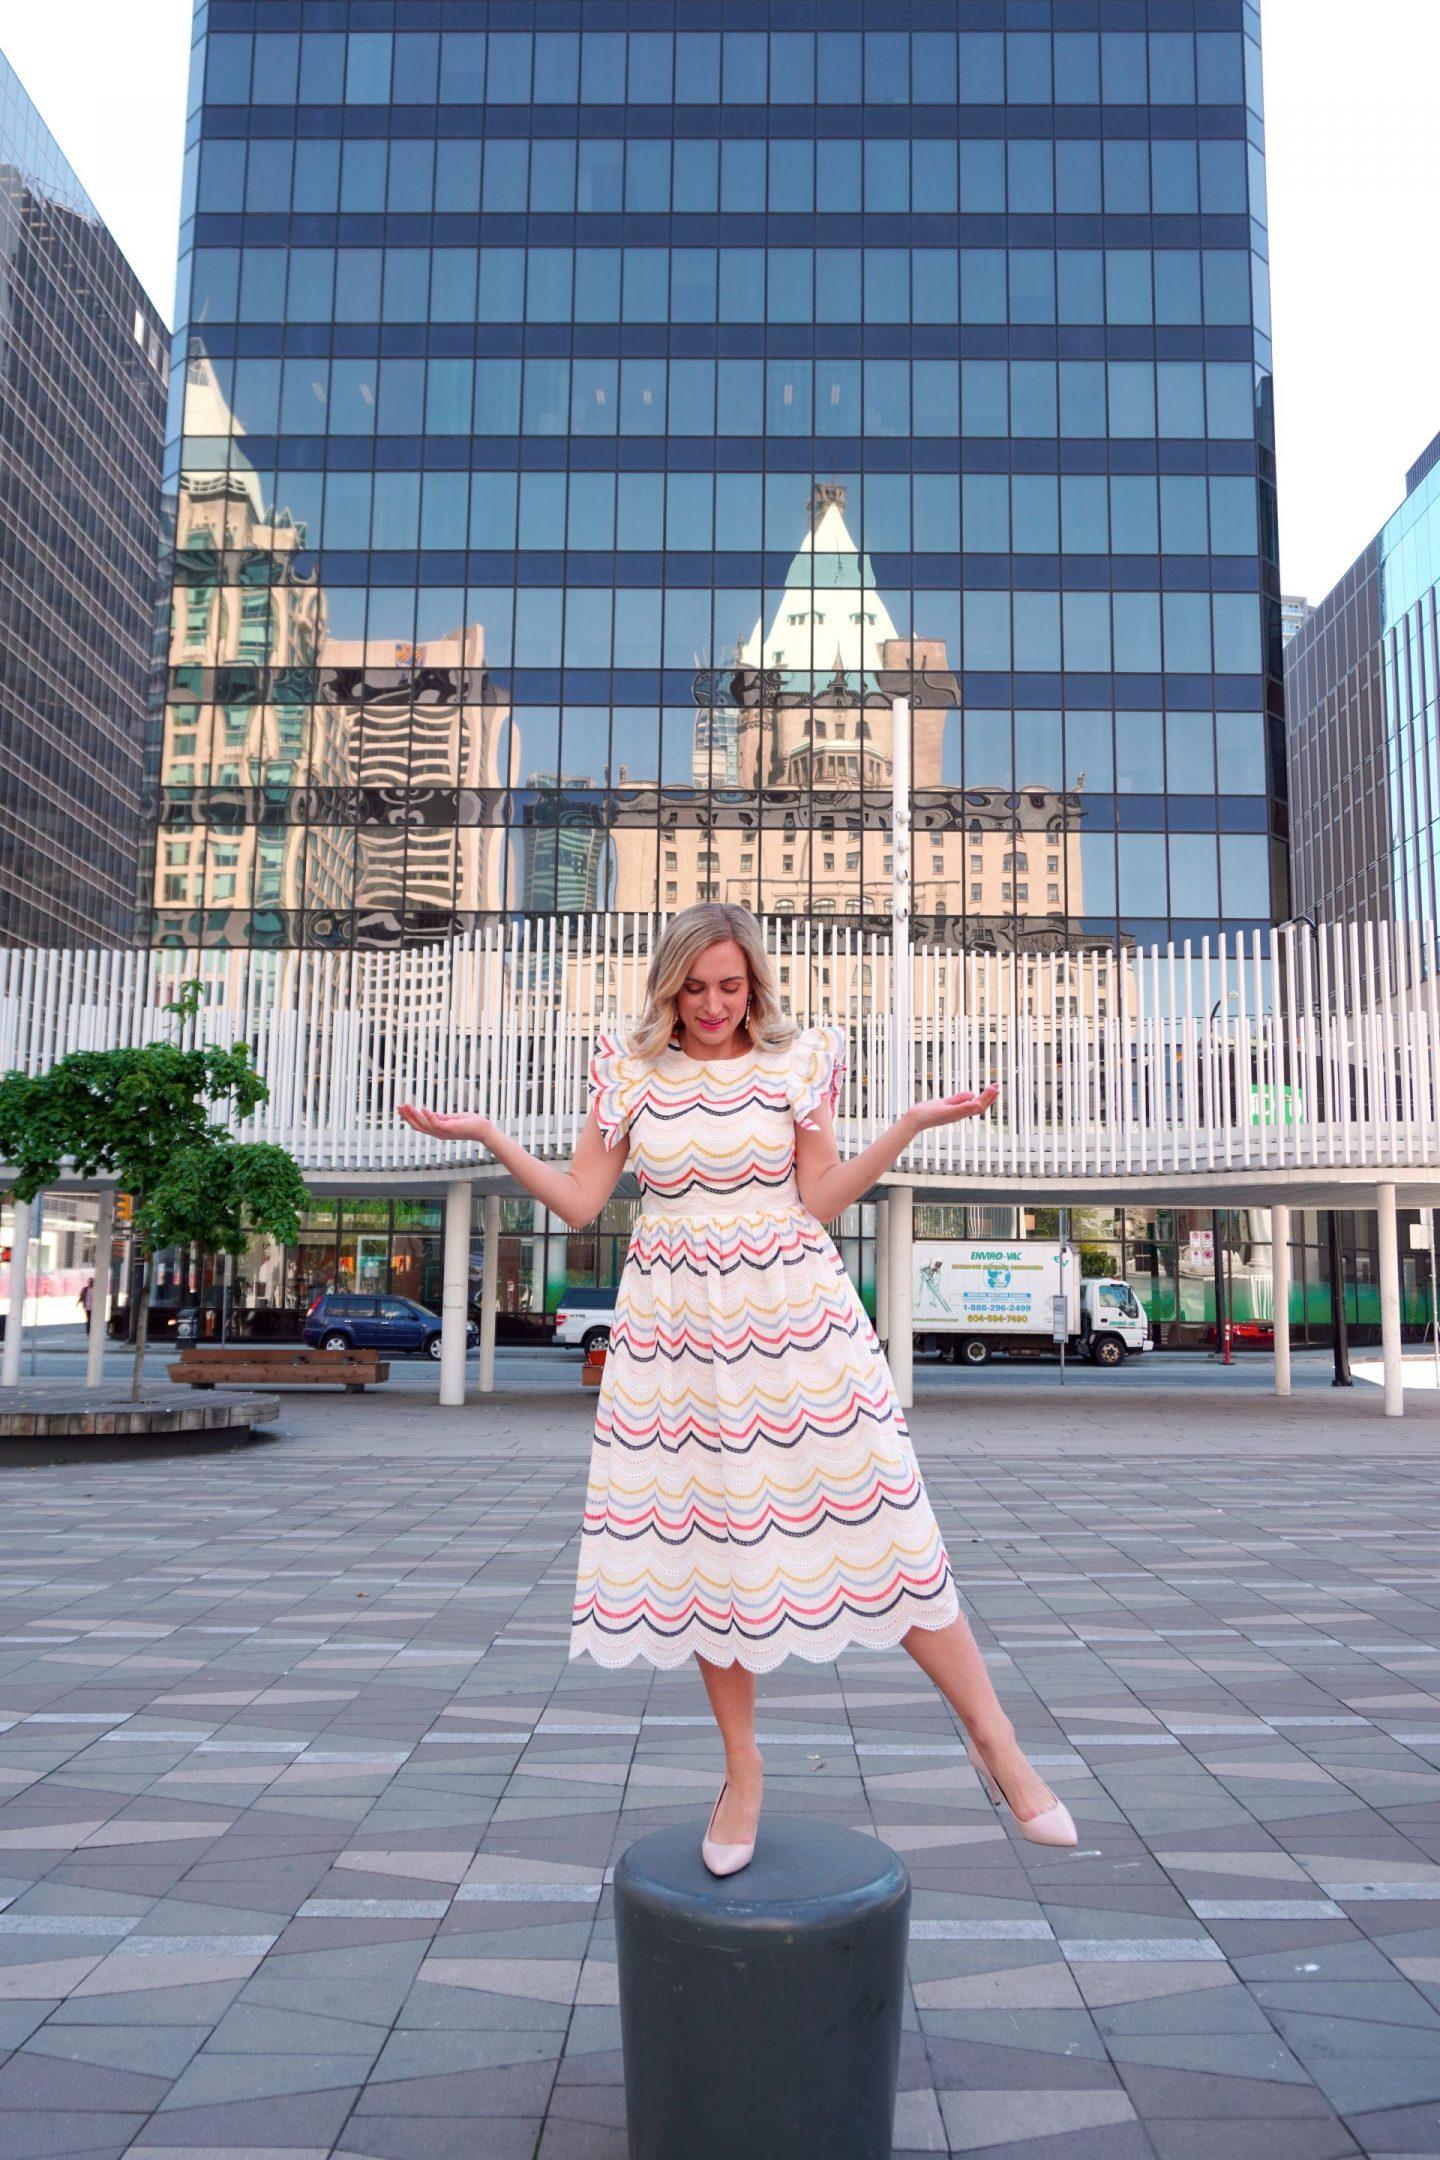 legallee blonde wearing an easter dress - 15 easter dresses under $100